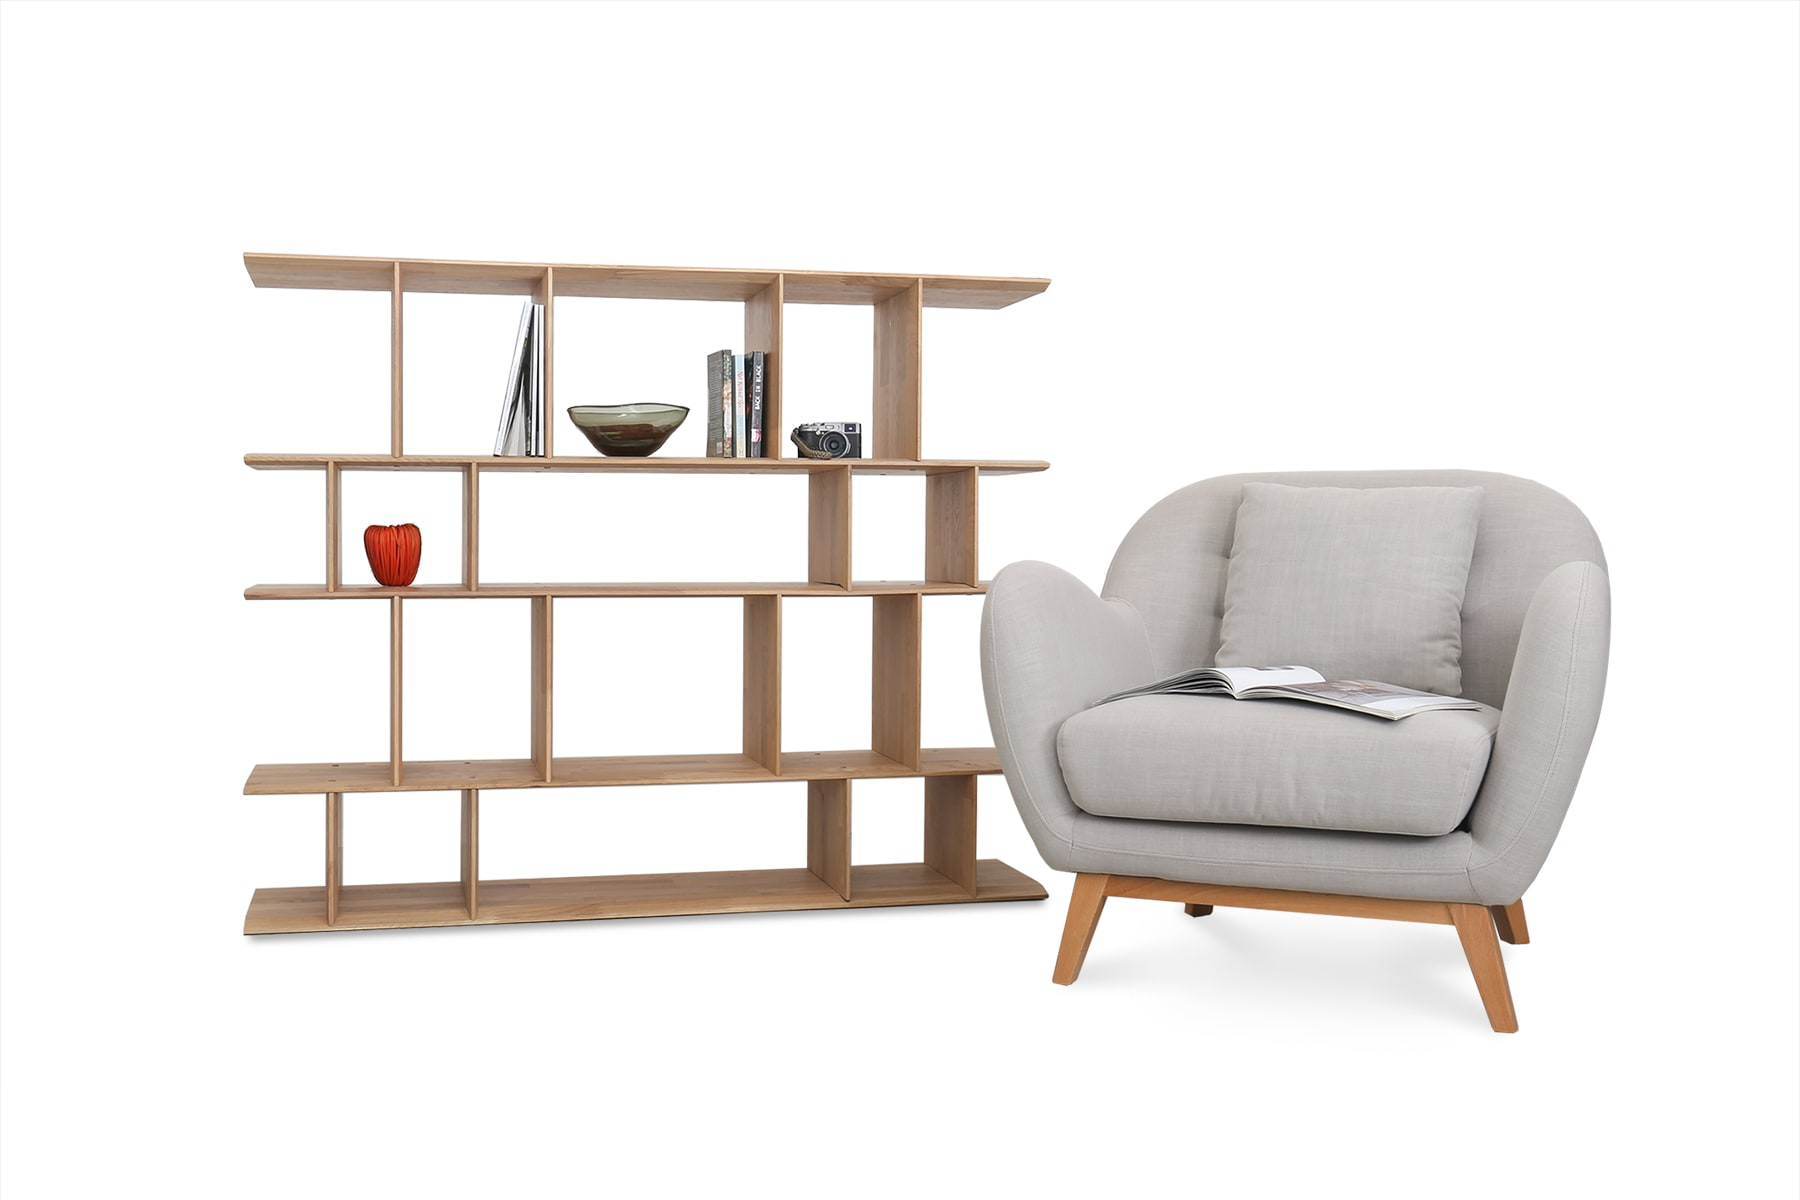 B3_Campbell Shelf